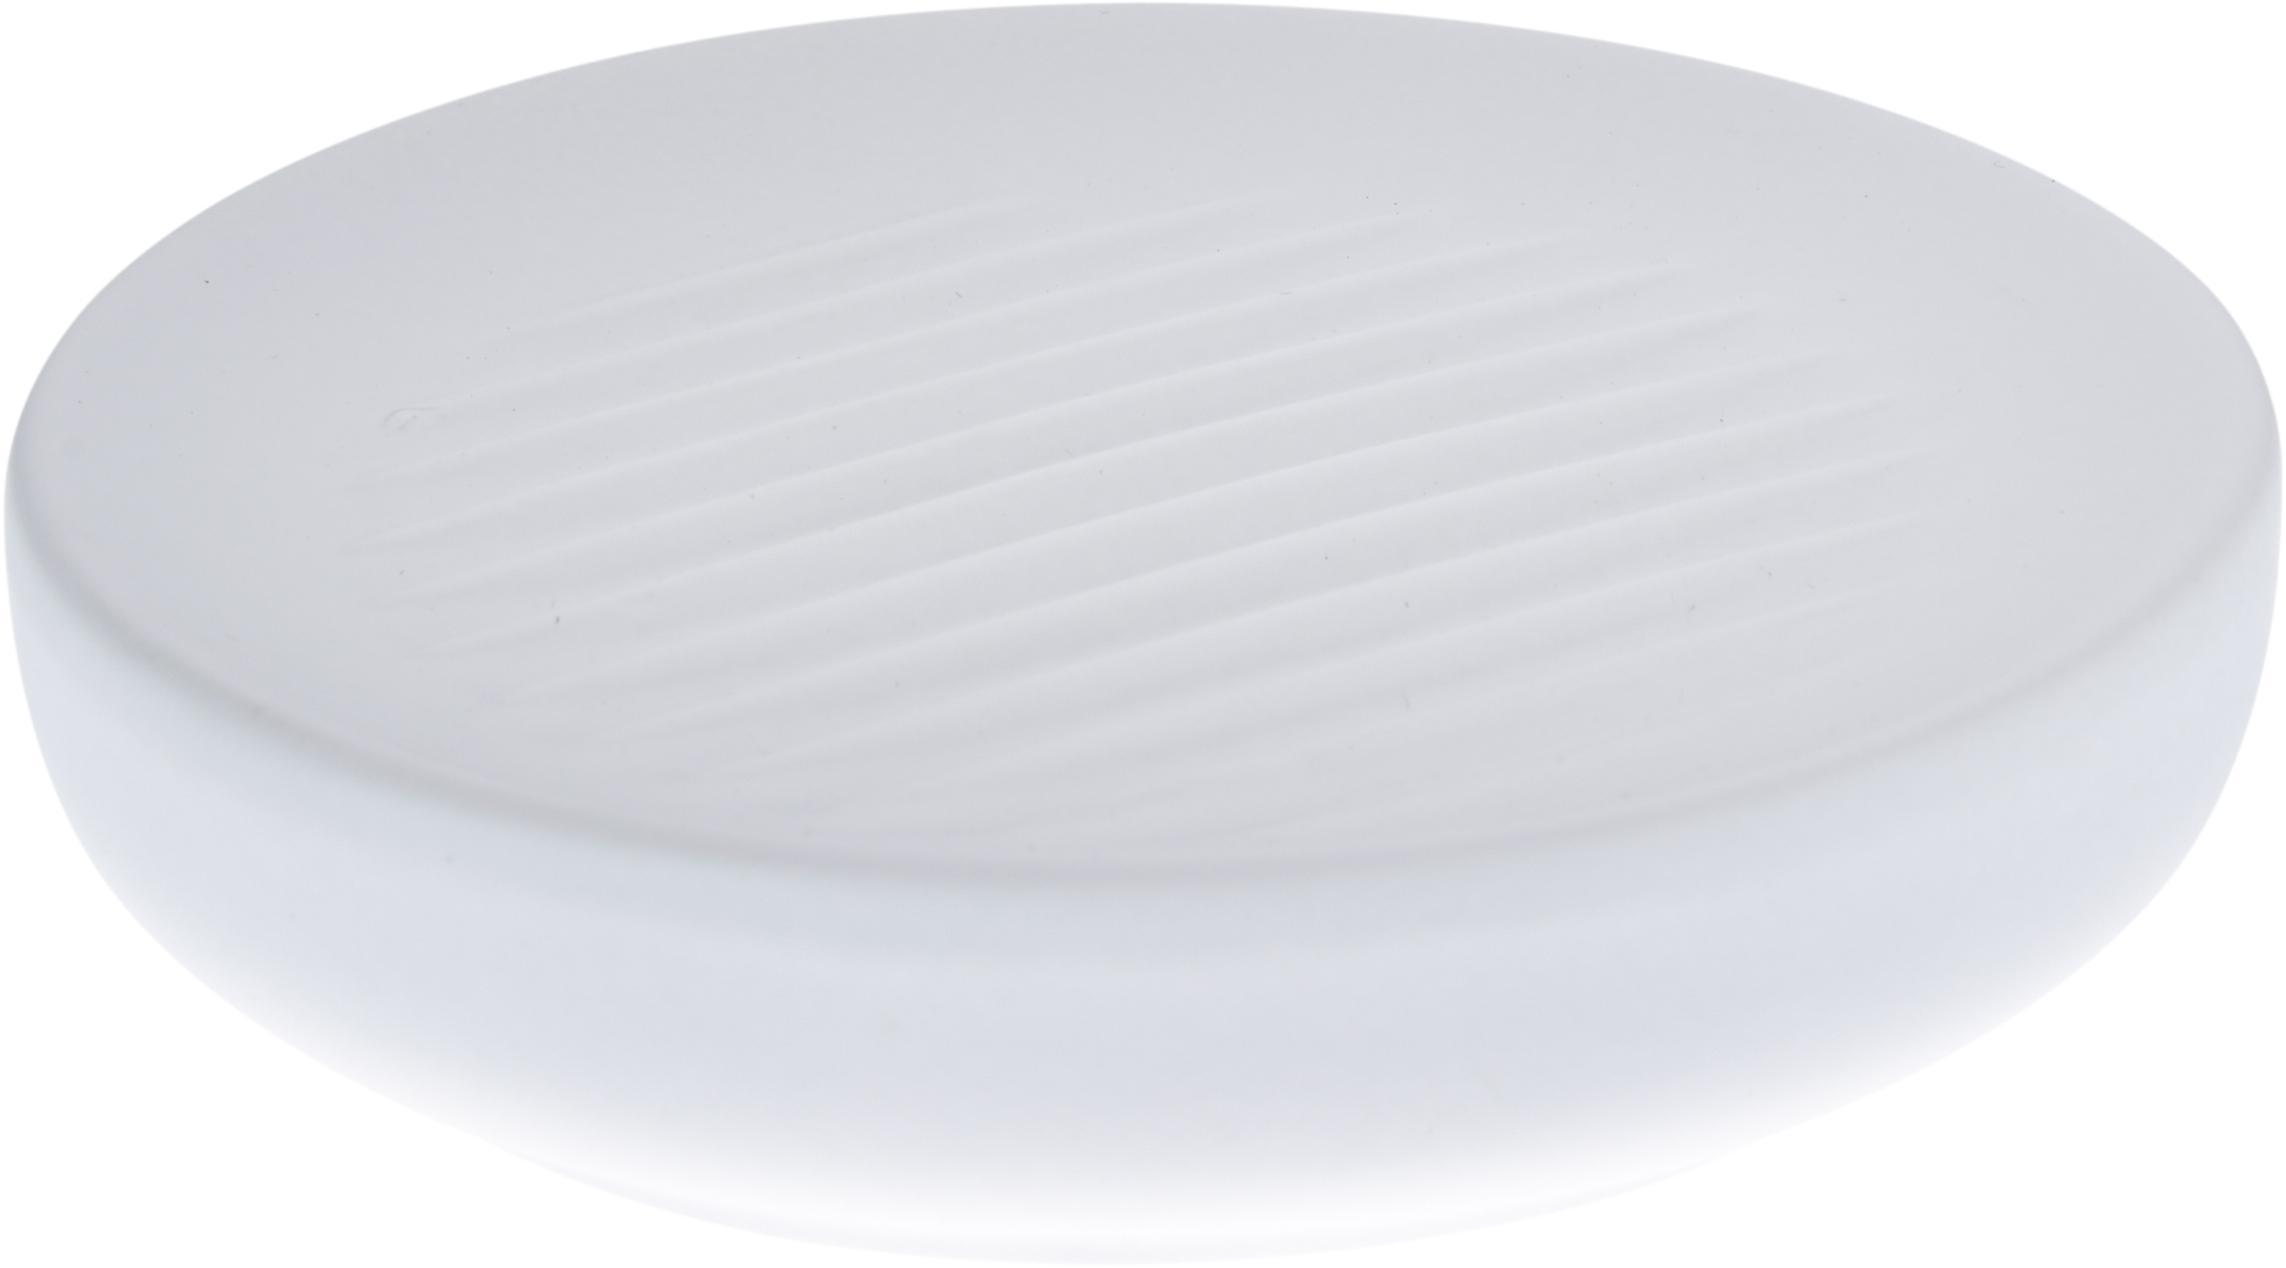 Portasapone in porcellana Ume, Porcellana, Bianco, Ø 12 x Alt. 3 cm